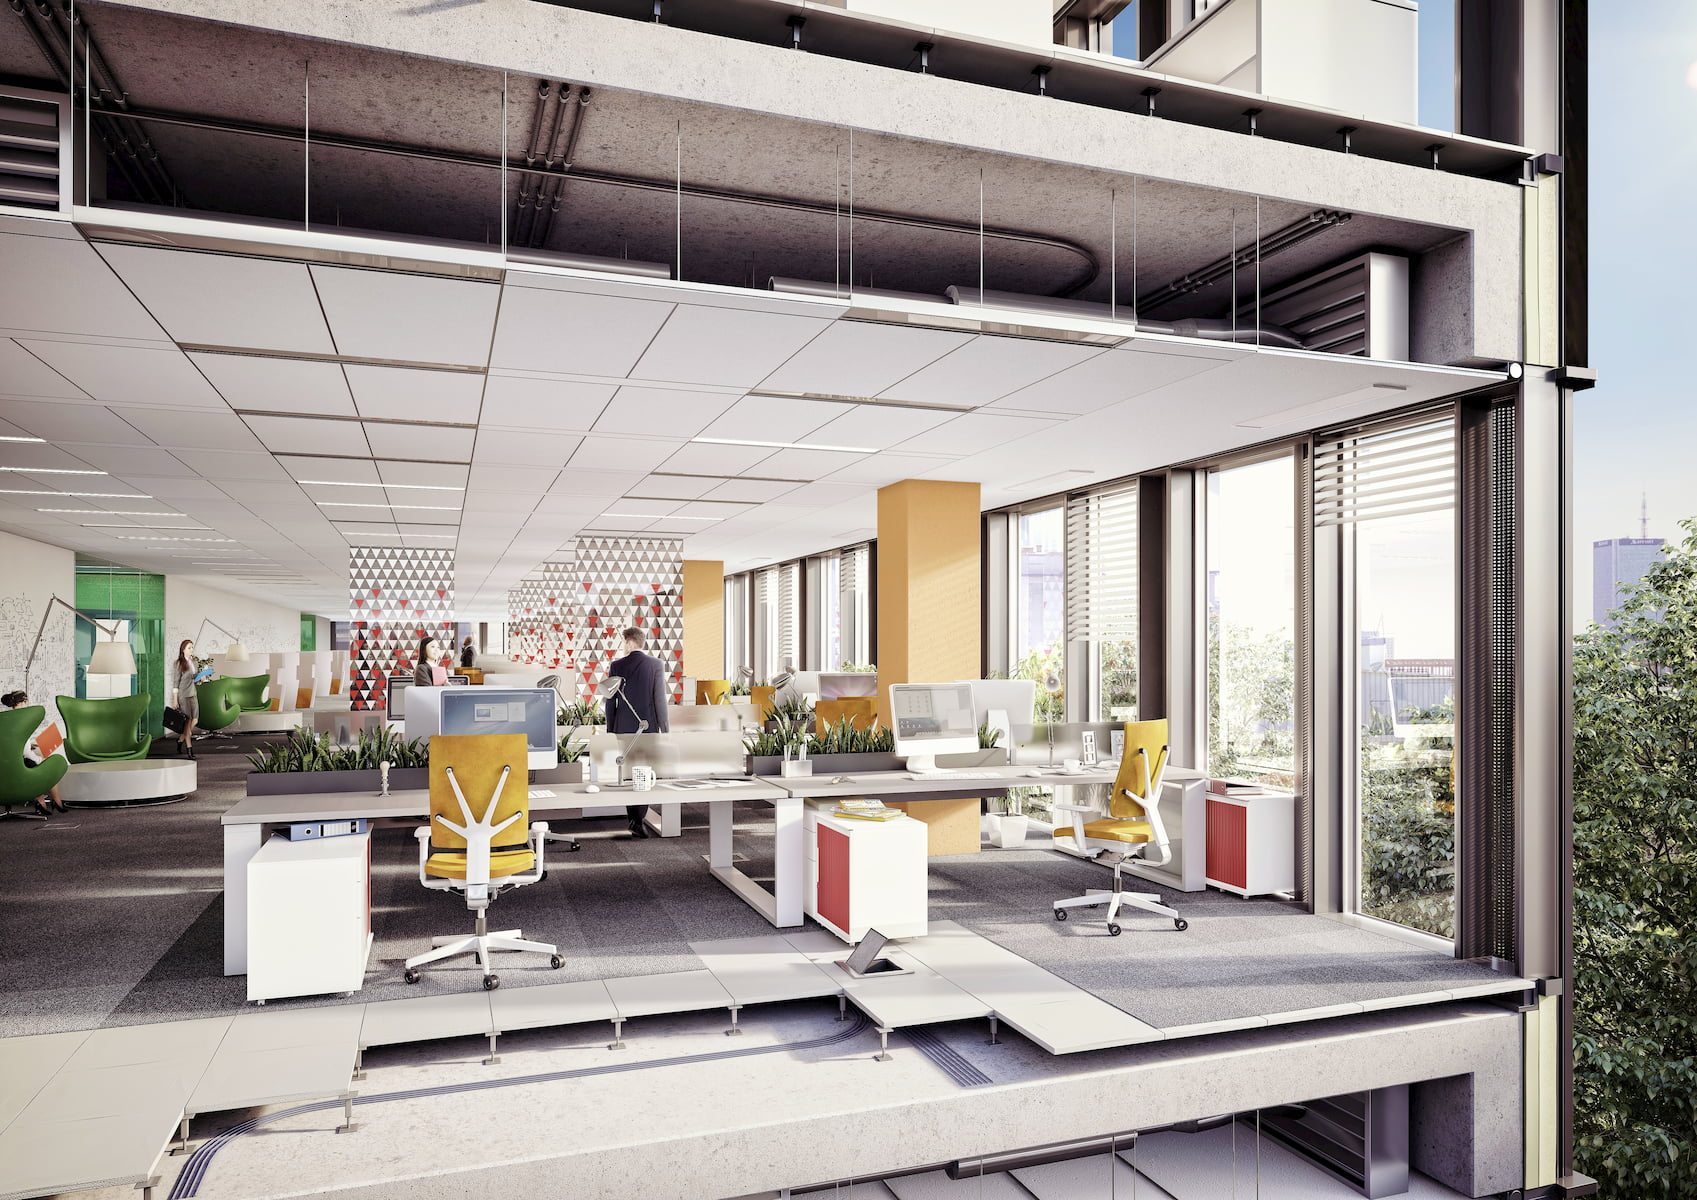 Lixa Office Park Yareal HRA Architekci 2014-2018 cross section